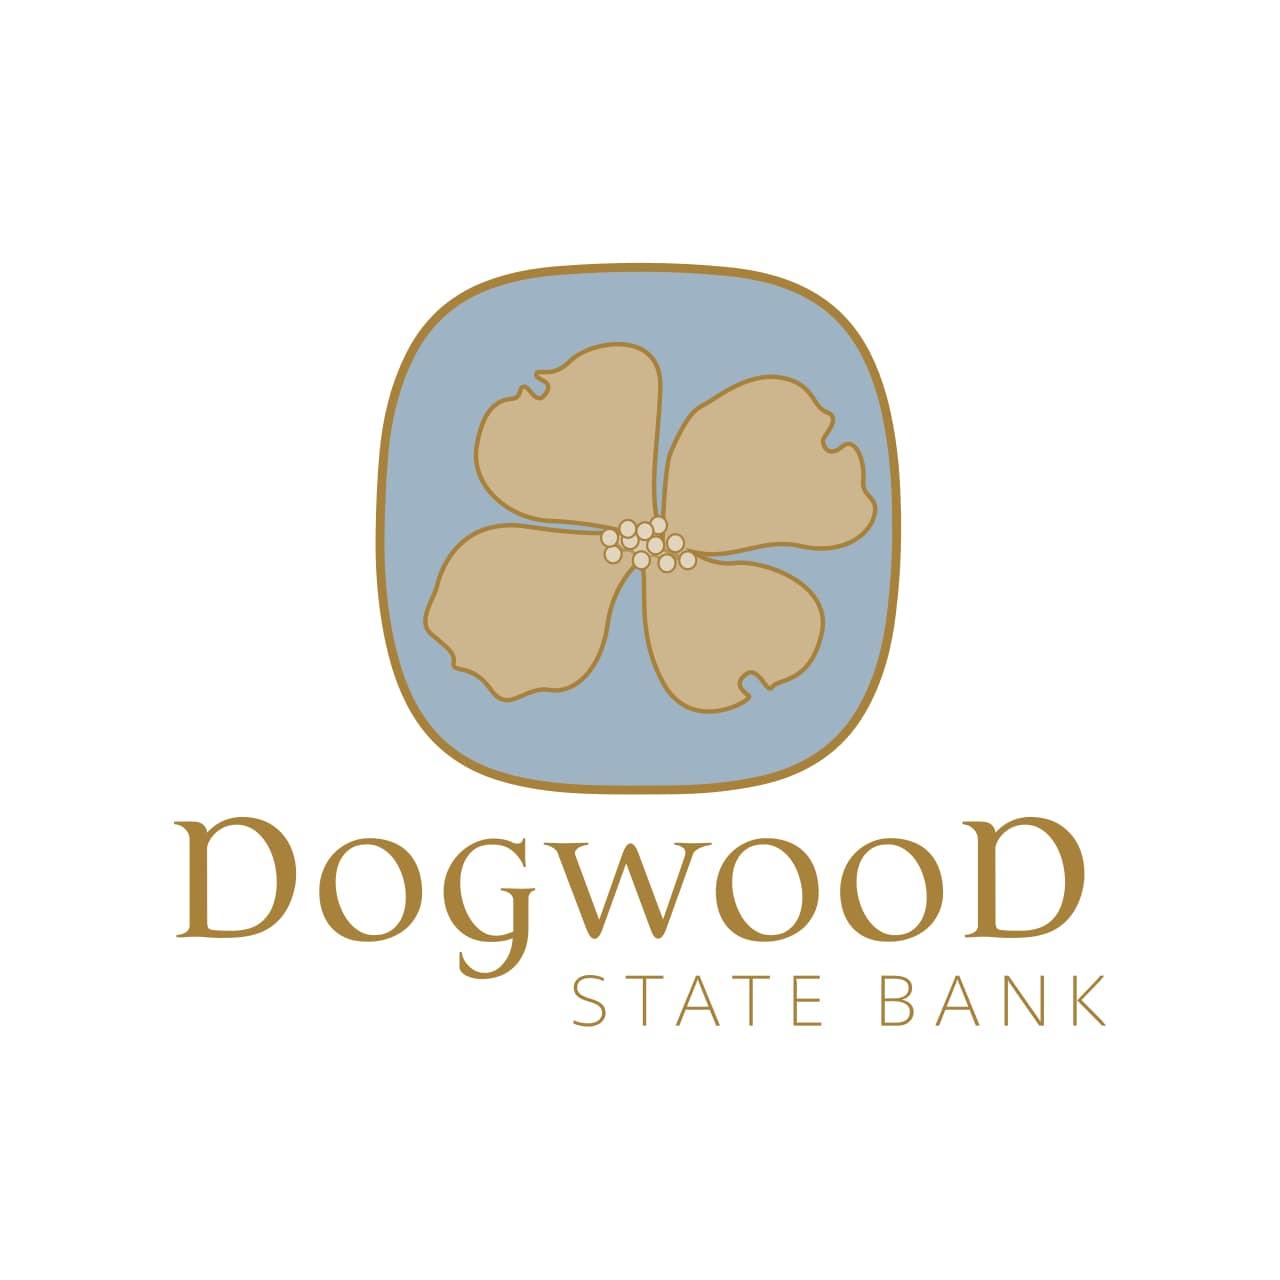 Dogwood2 High Res (003)